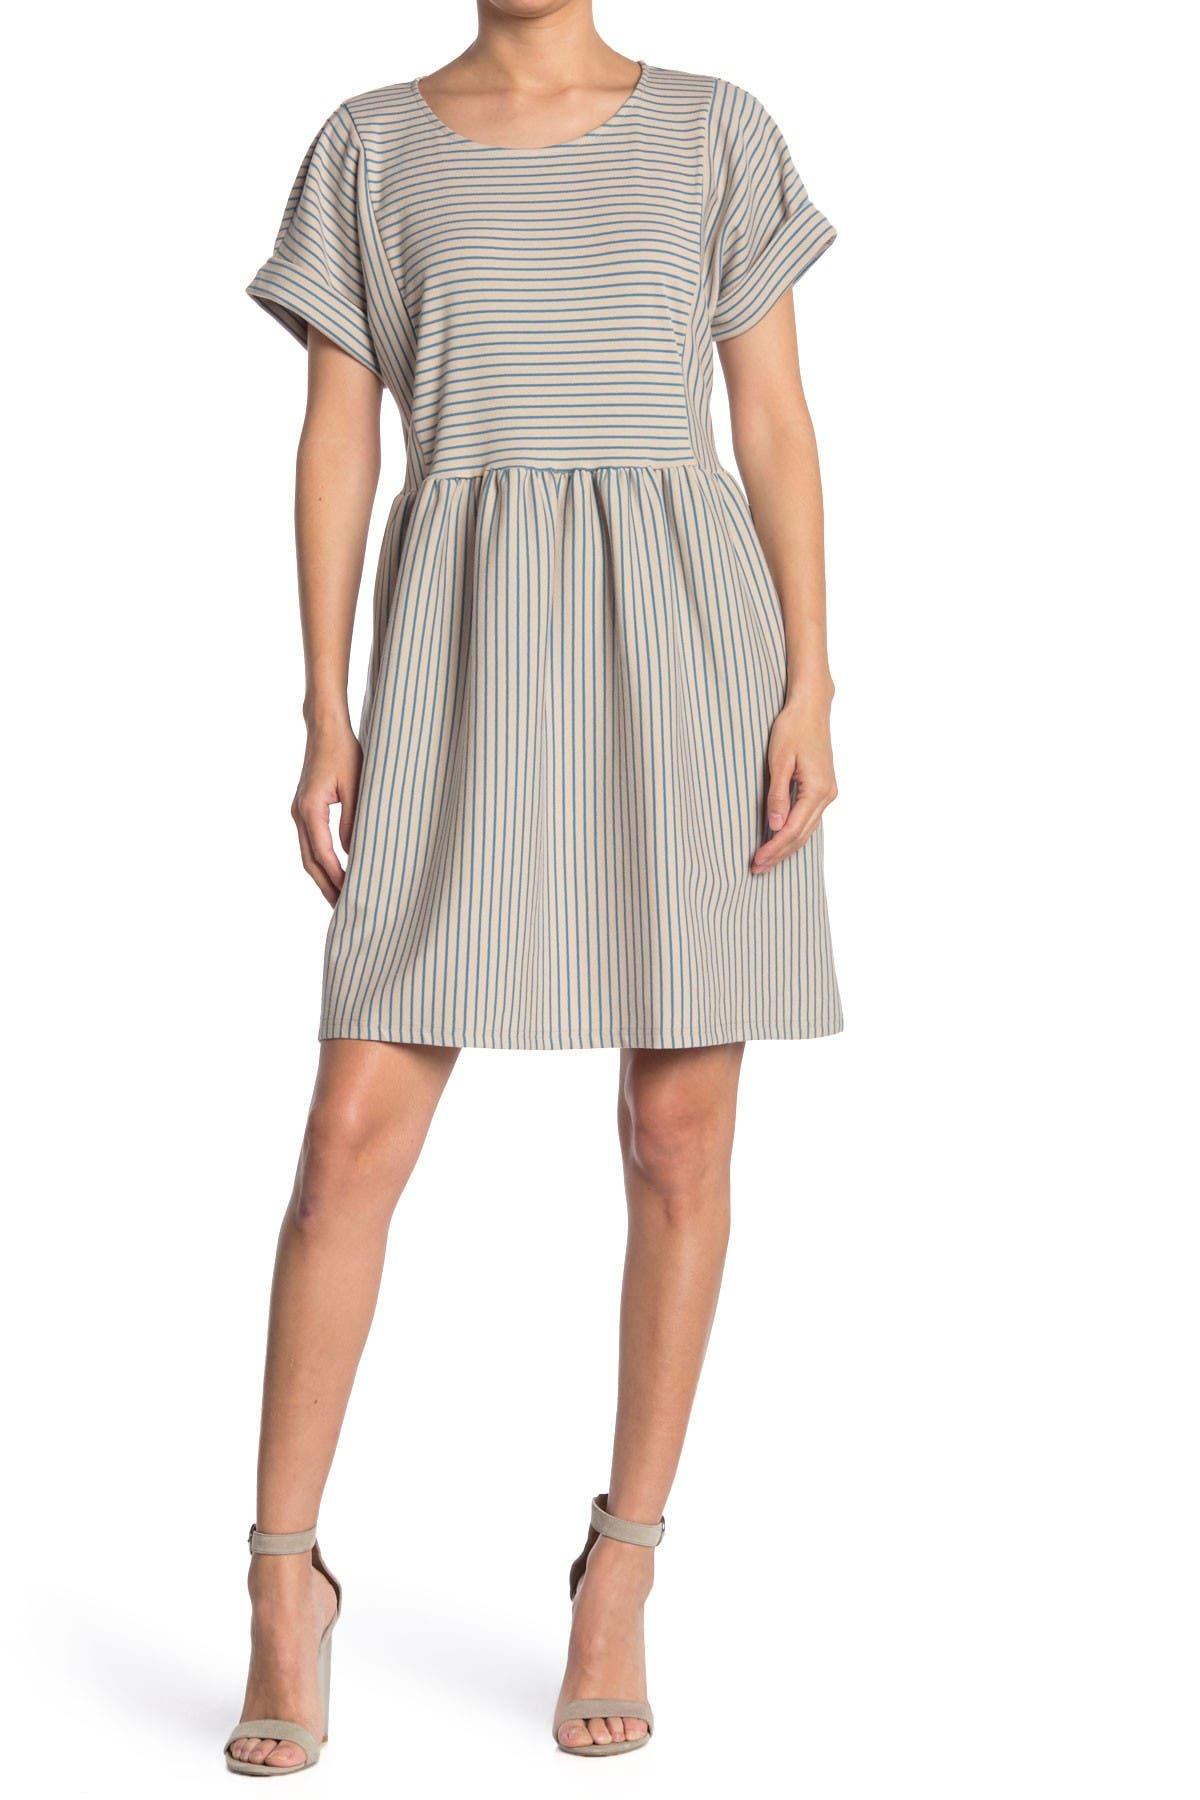 Image of MELLODAY Short Sleeve Stripe Print Knit Mini Dress